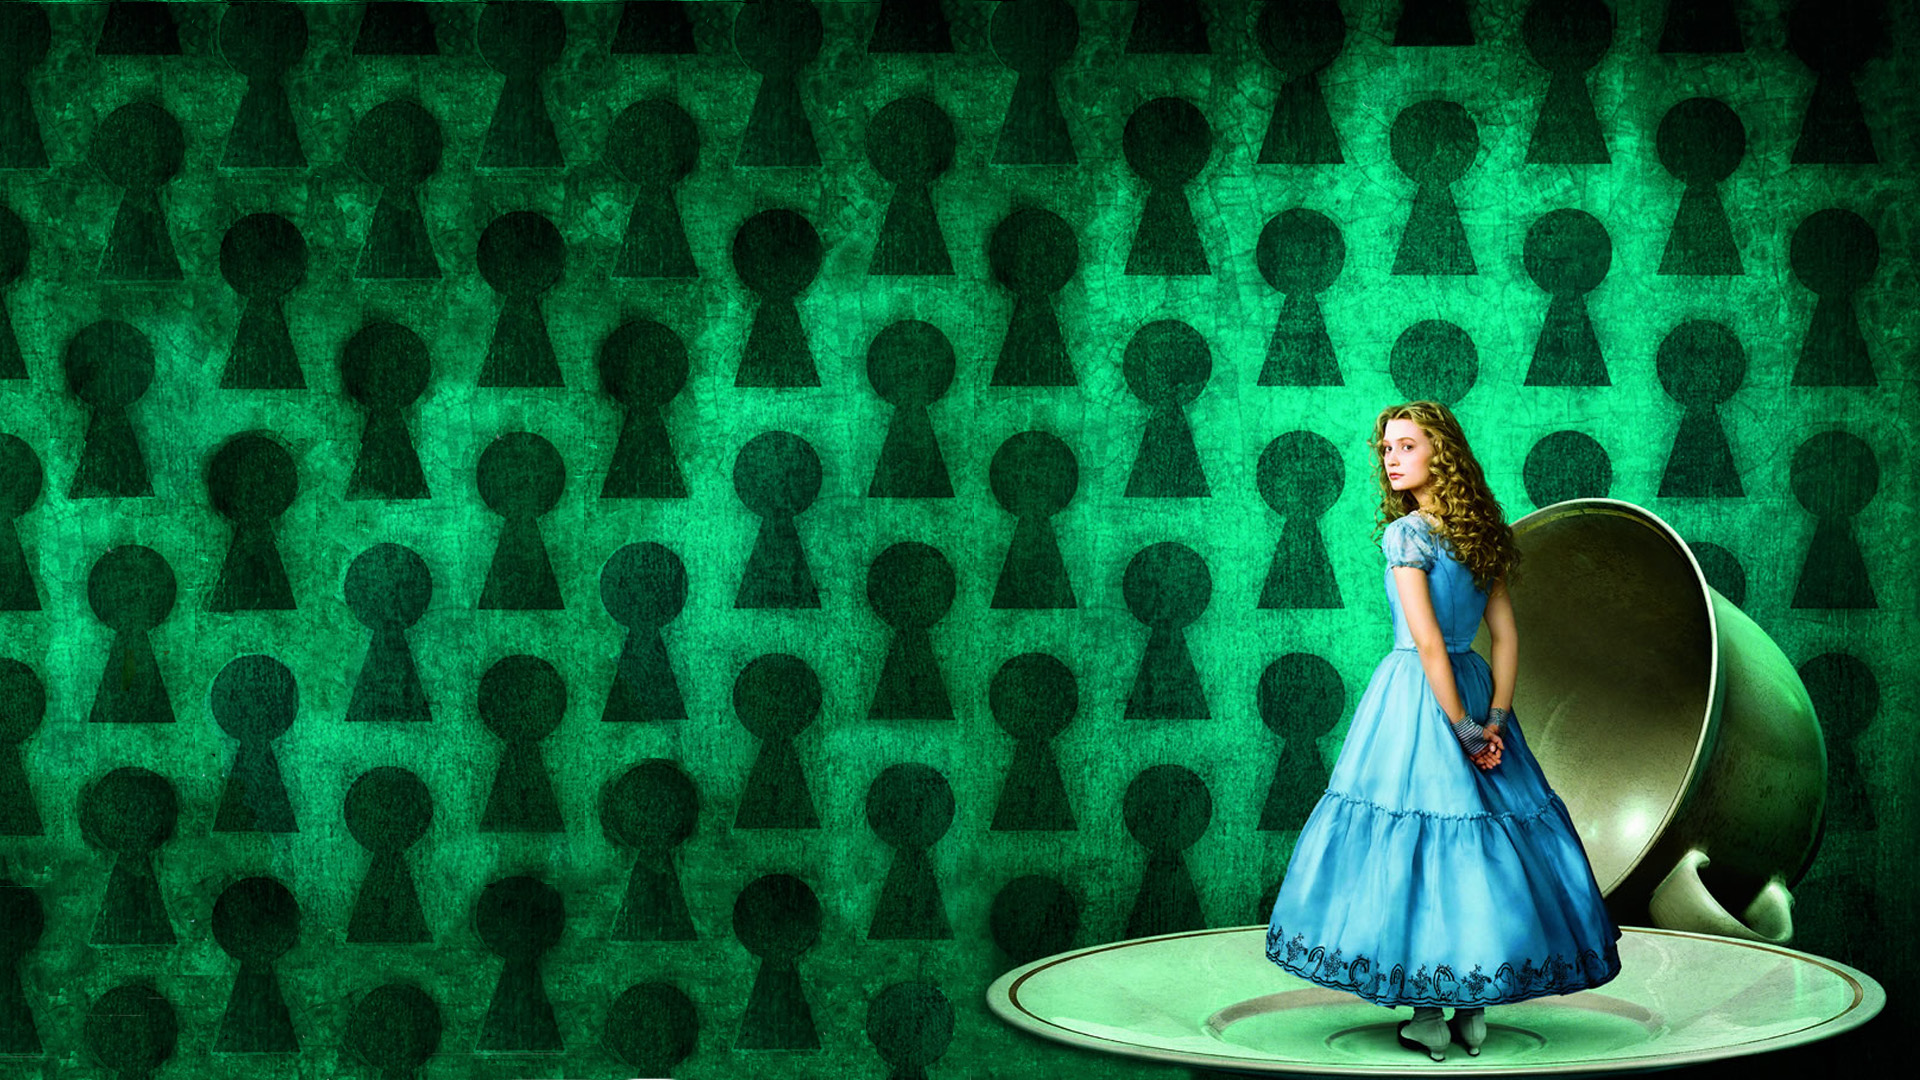 Alice Nos Pais Das Maravilhas Filme Online alice in wonderland (2010) wallpapers, pictures, images